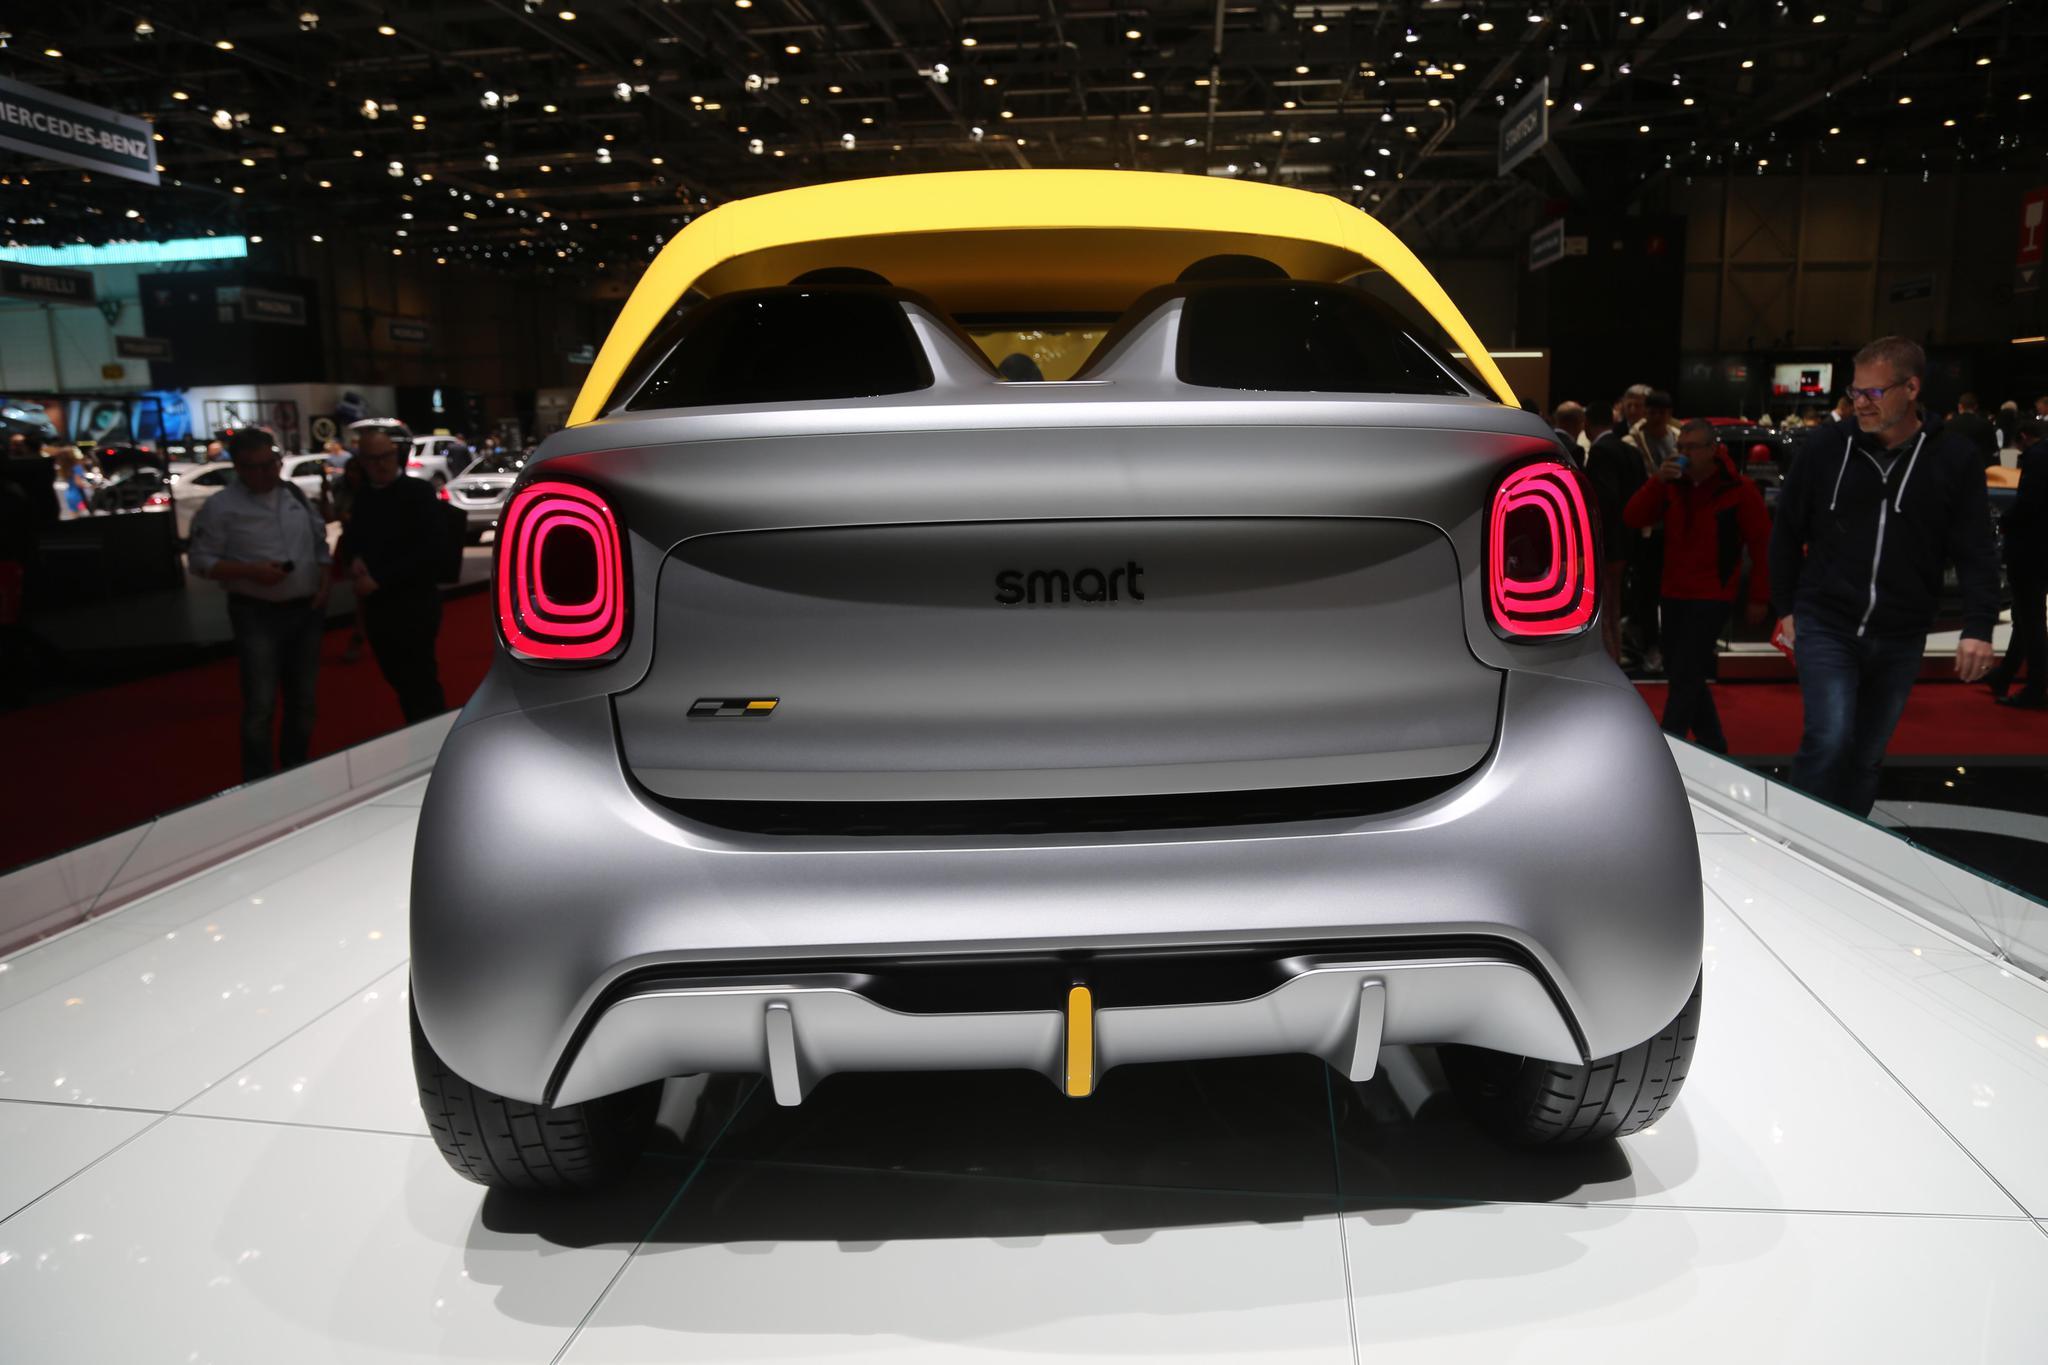 ARCFOX概念车、Smart概念车、Tata概念车,你选谁?